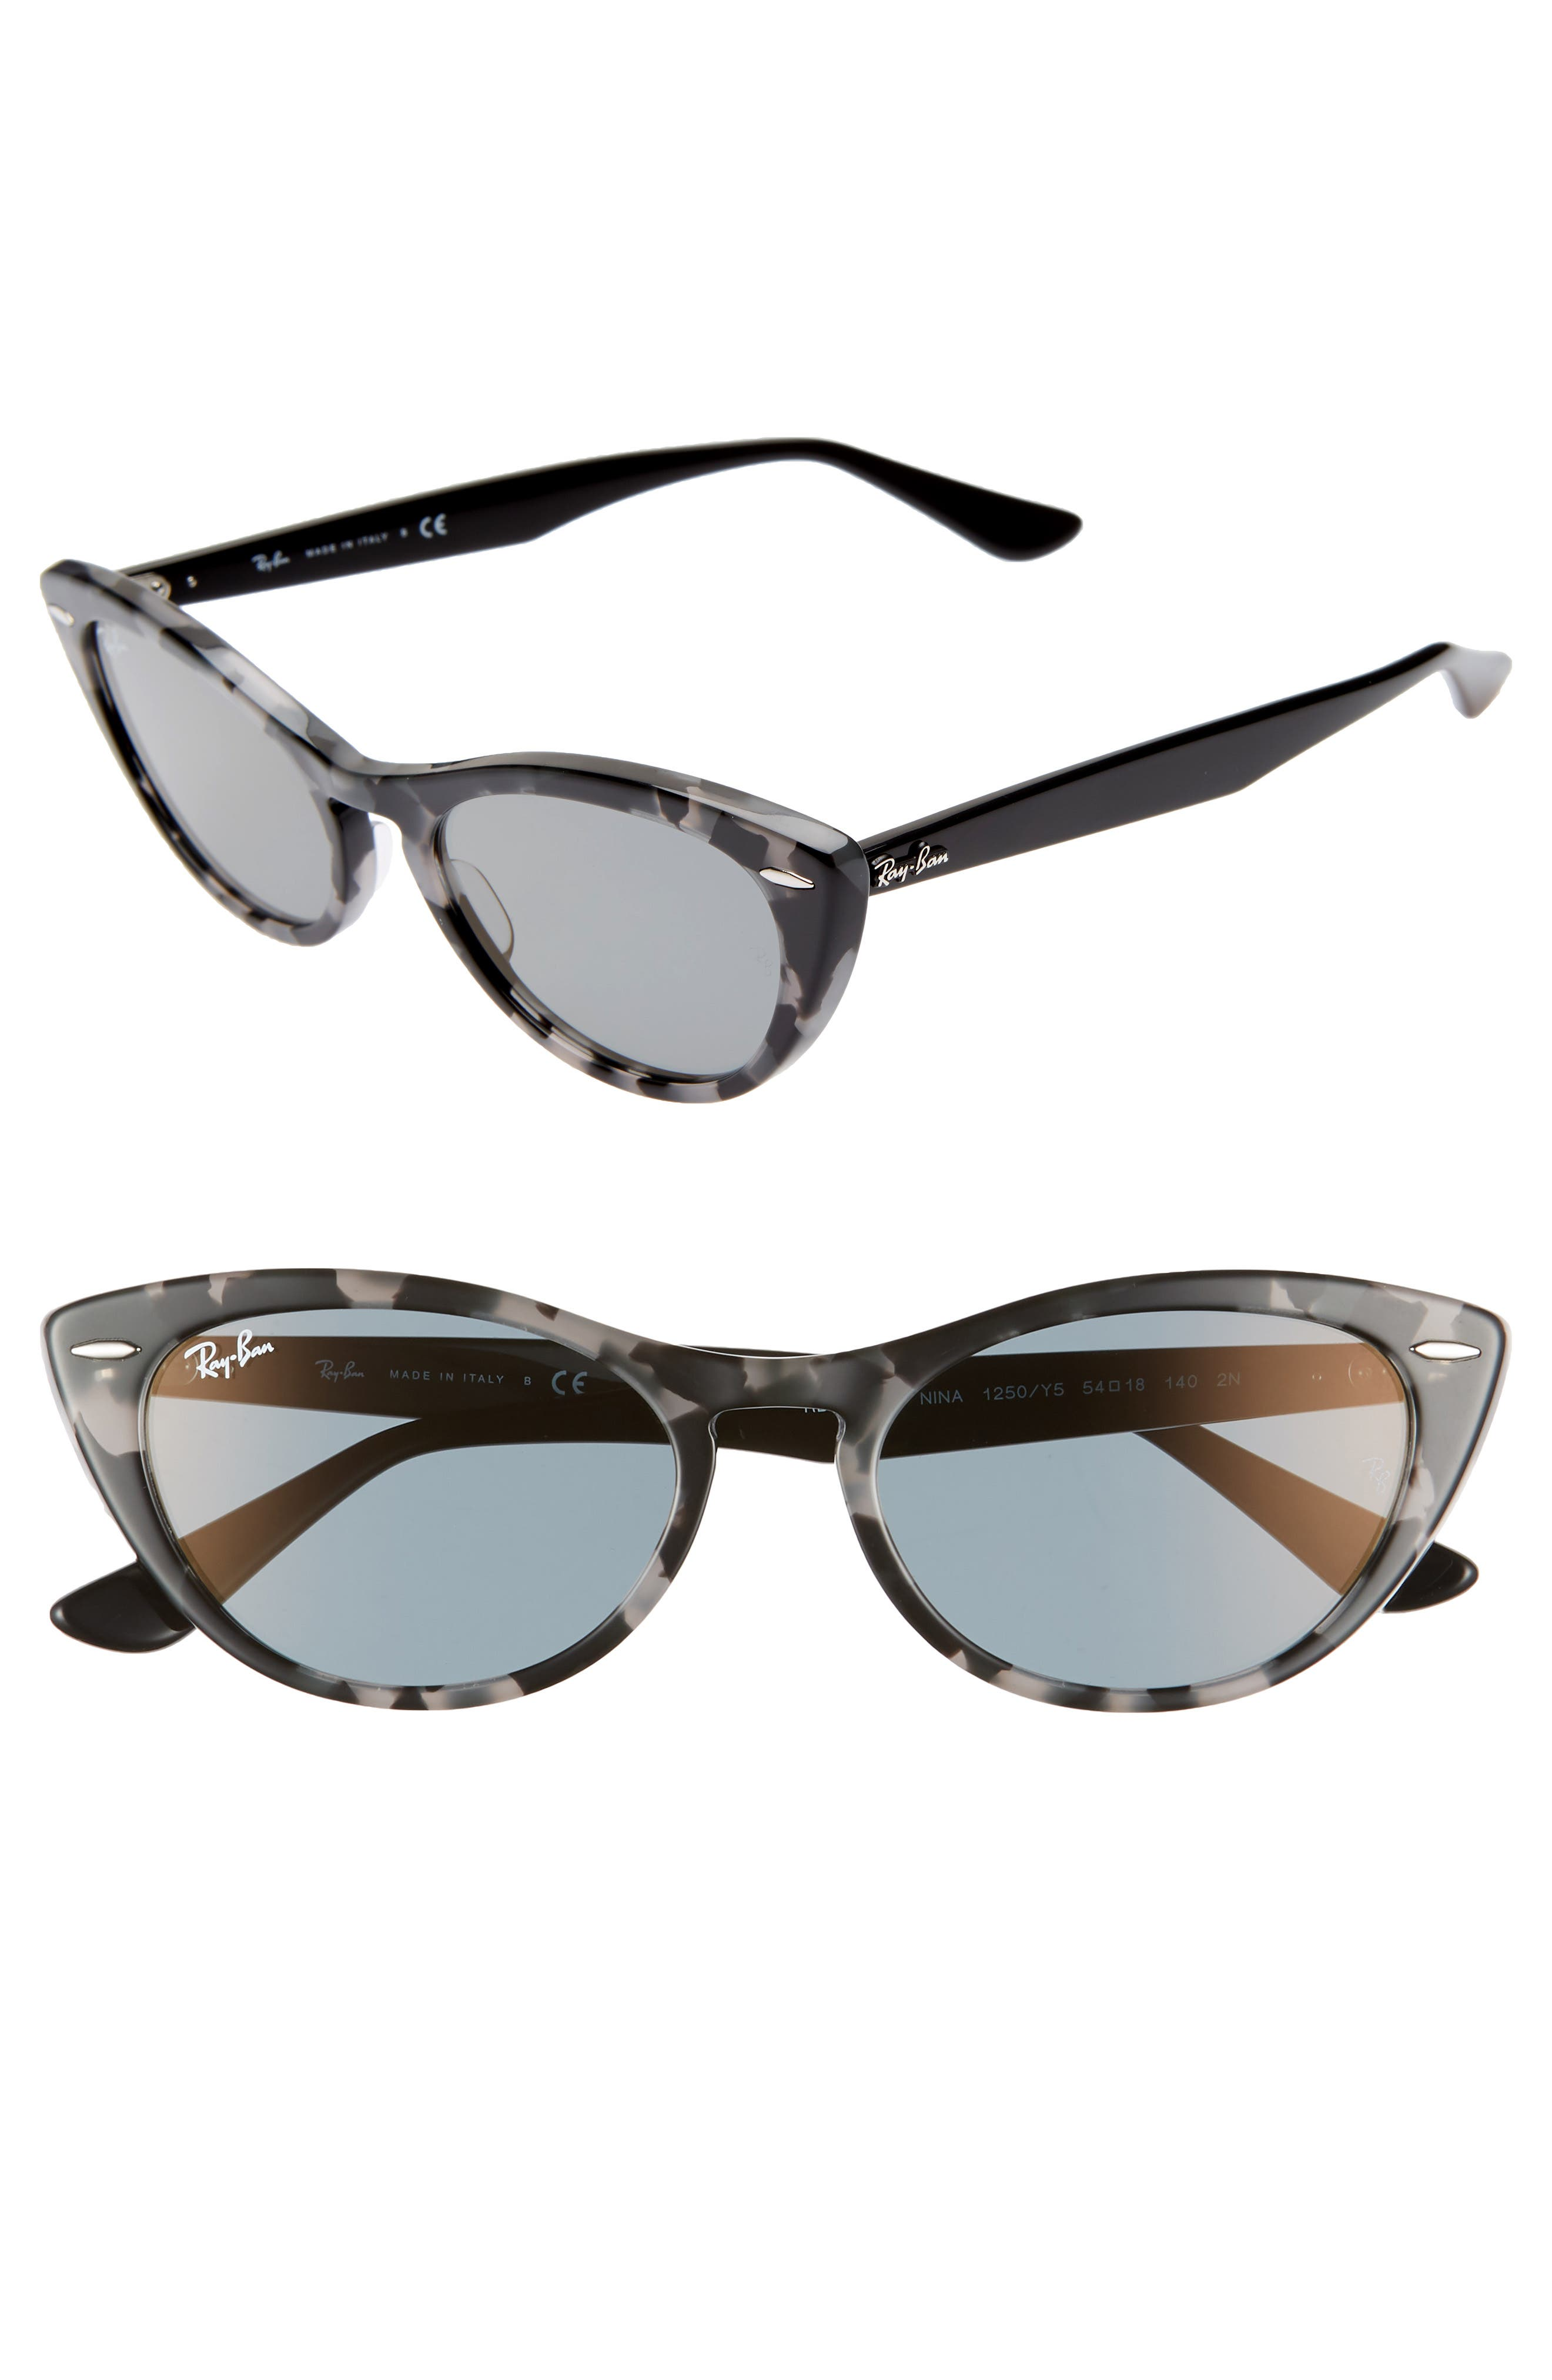 Ray-Ban Nina 5m Cat Eye Sunglasses - Grey Havana Grey Solid